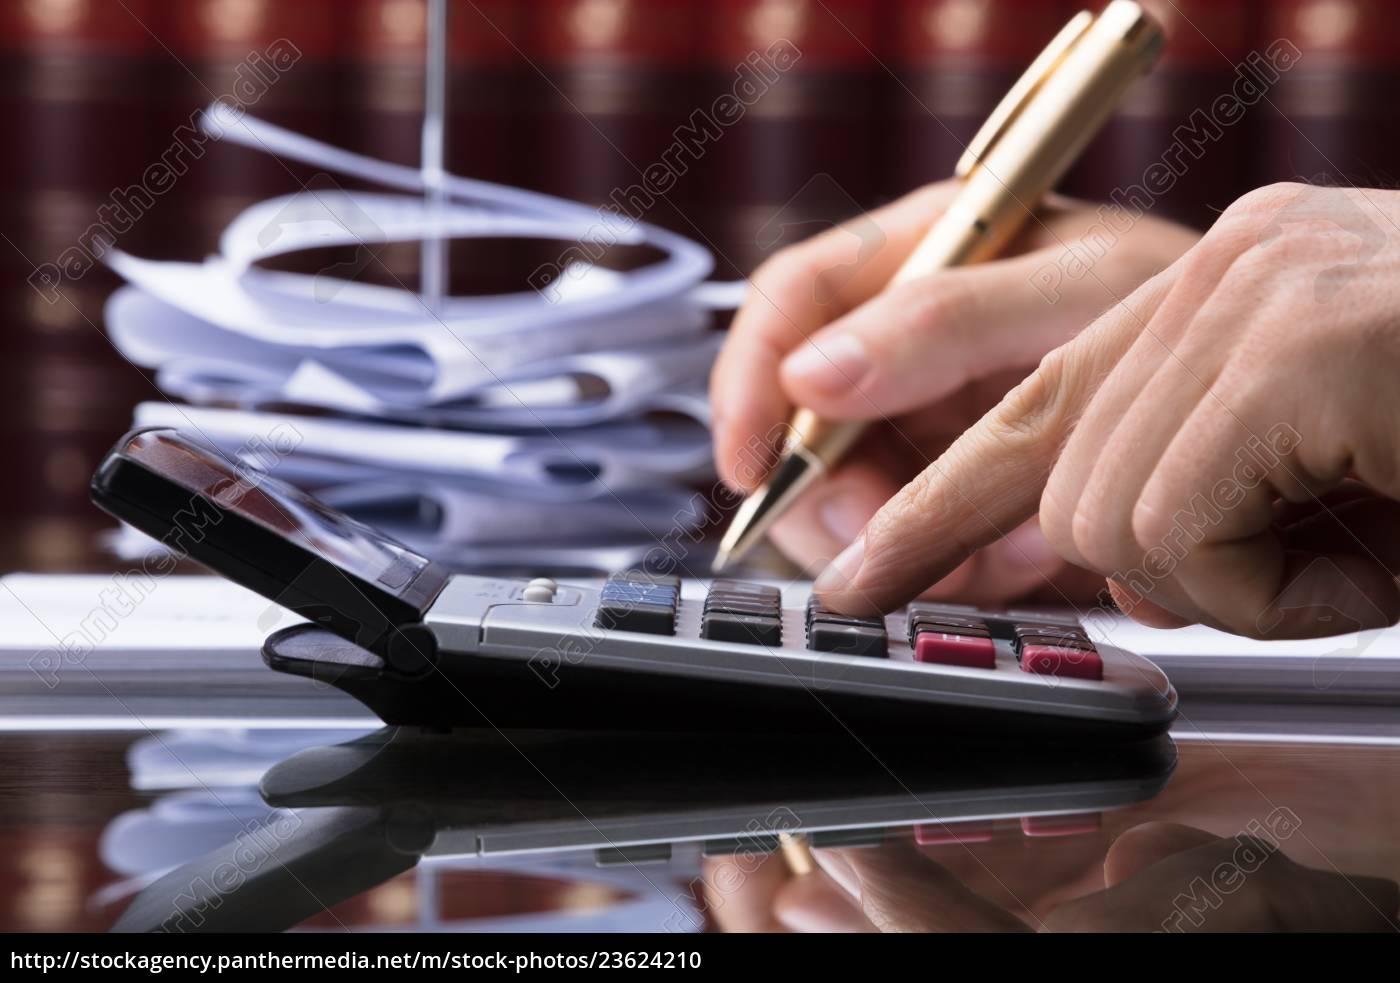 human, hand, calculating, bill - 23624210